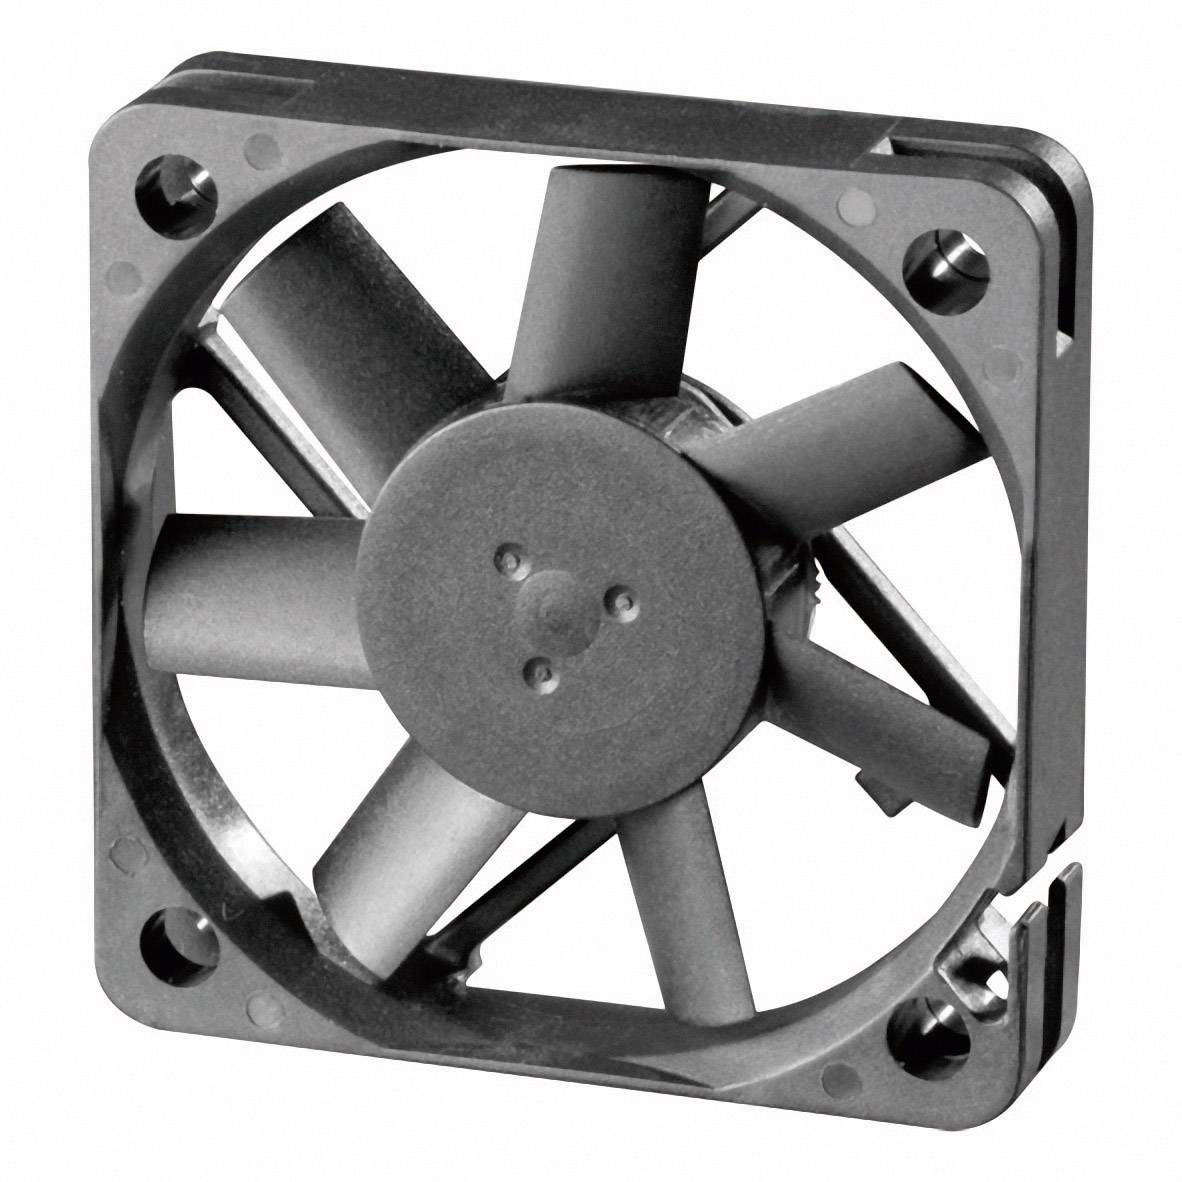 Axiálny ventilátor Sunon EB50100S2-000U-999 EB50100S2-000U-999, 5 V/DC, 26 dB, (d x š x v) 50 x 50 x 10 mm